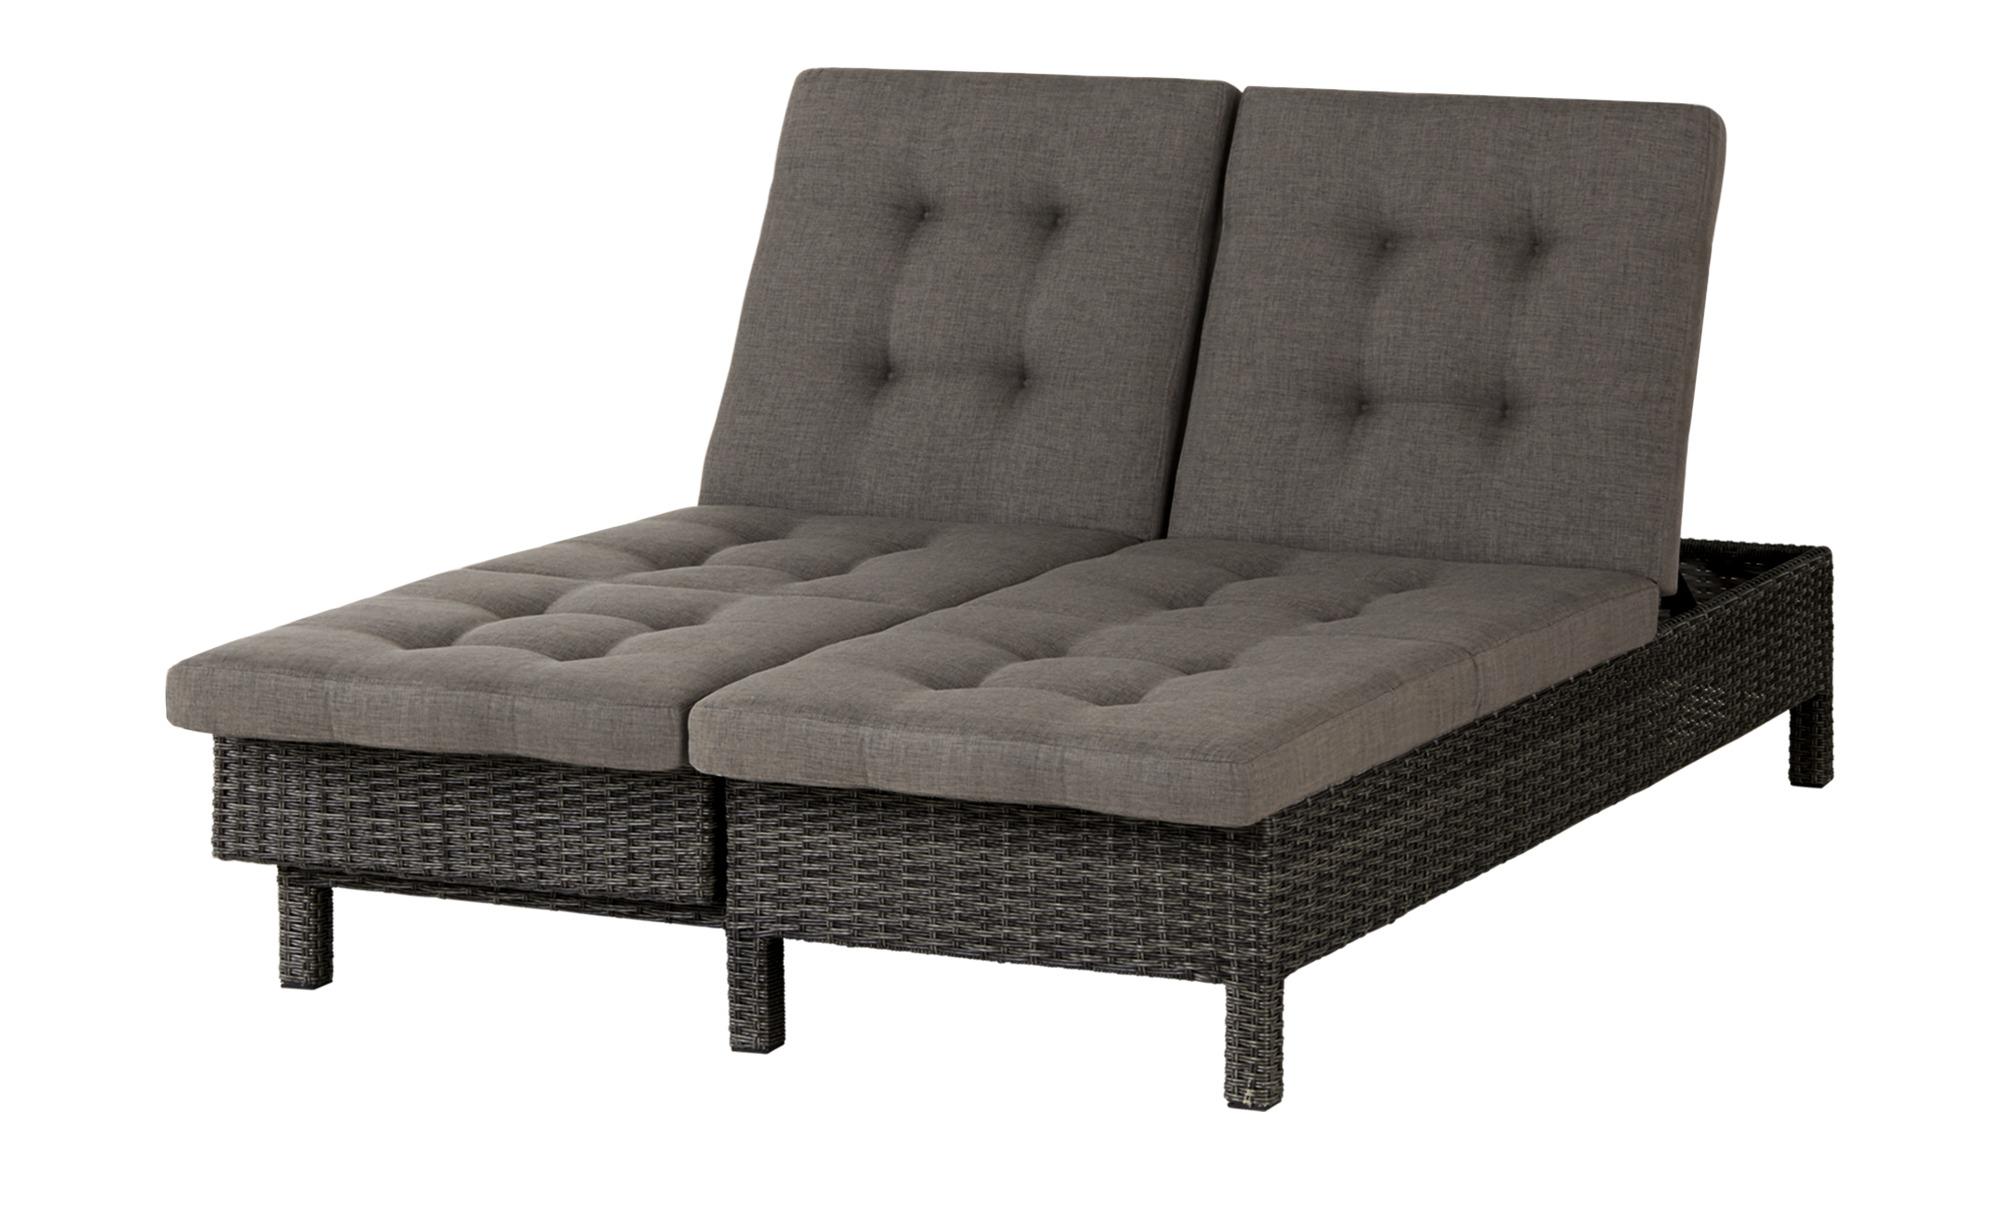 A Casa Mia Garten Lounge Sofa 3 Sitzer Padua Möbel Kraft